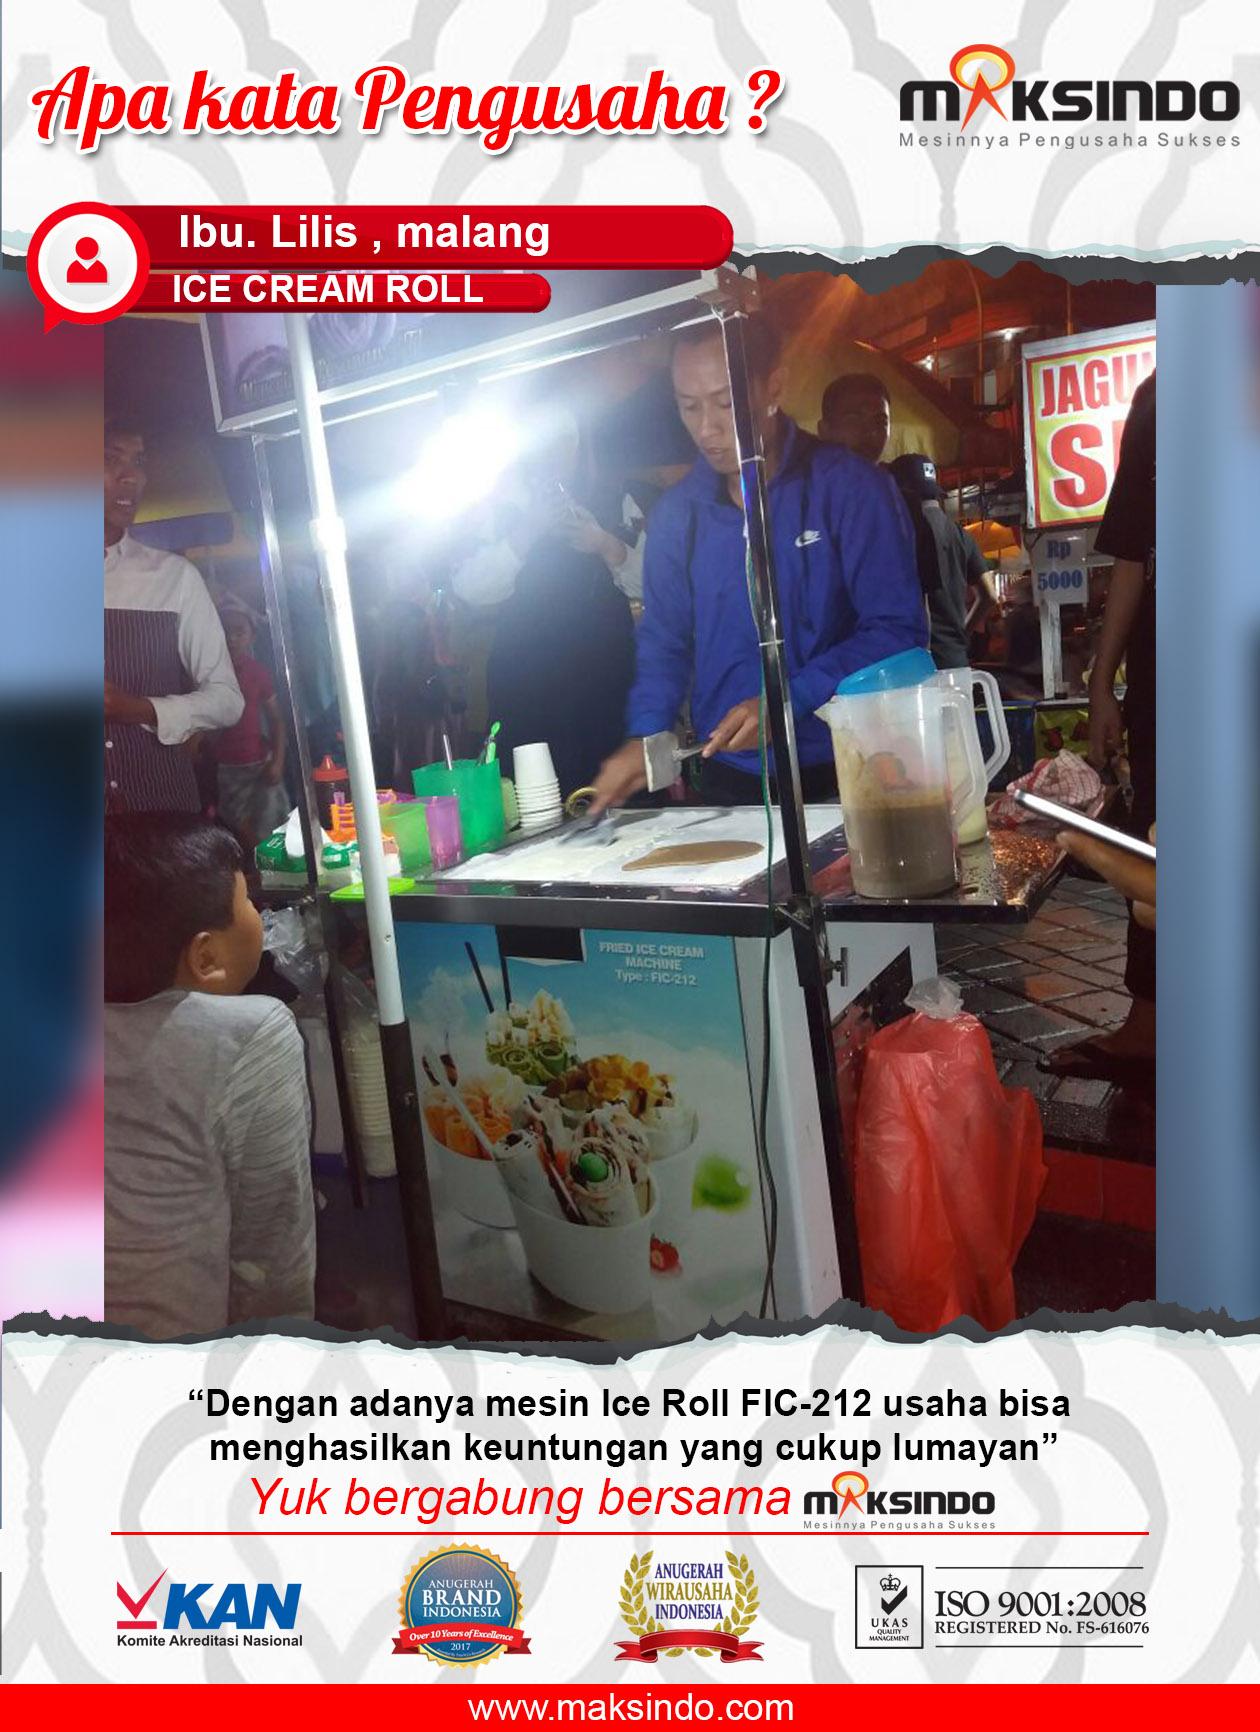 Ice Cream Roll : Mesin Ice Cream Roll Mendatangkan Keuntungan